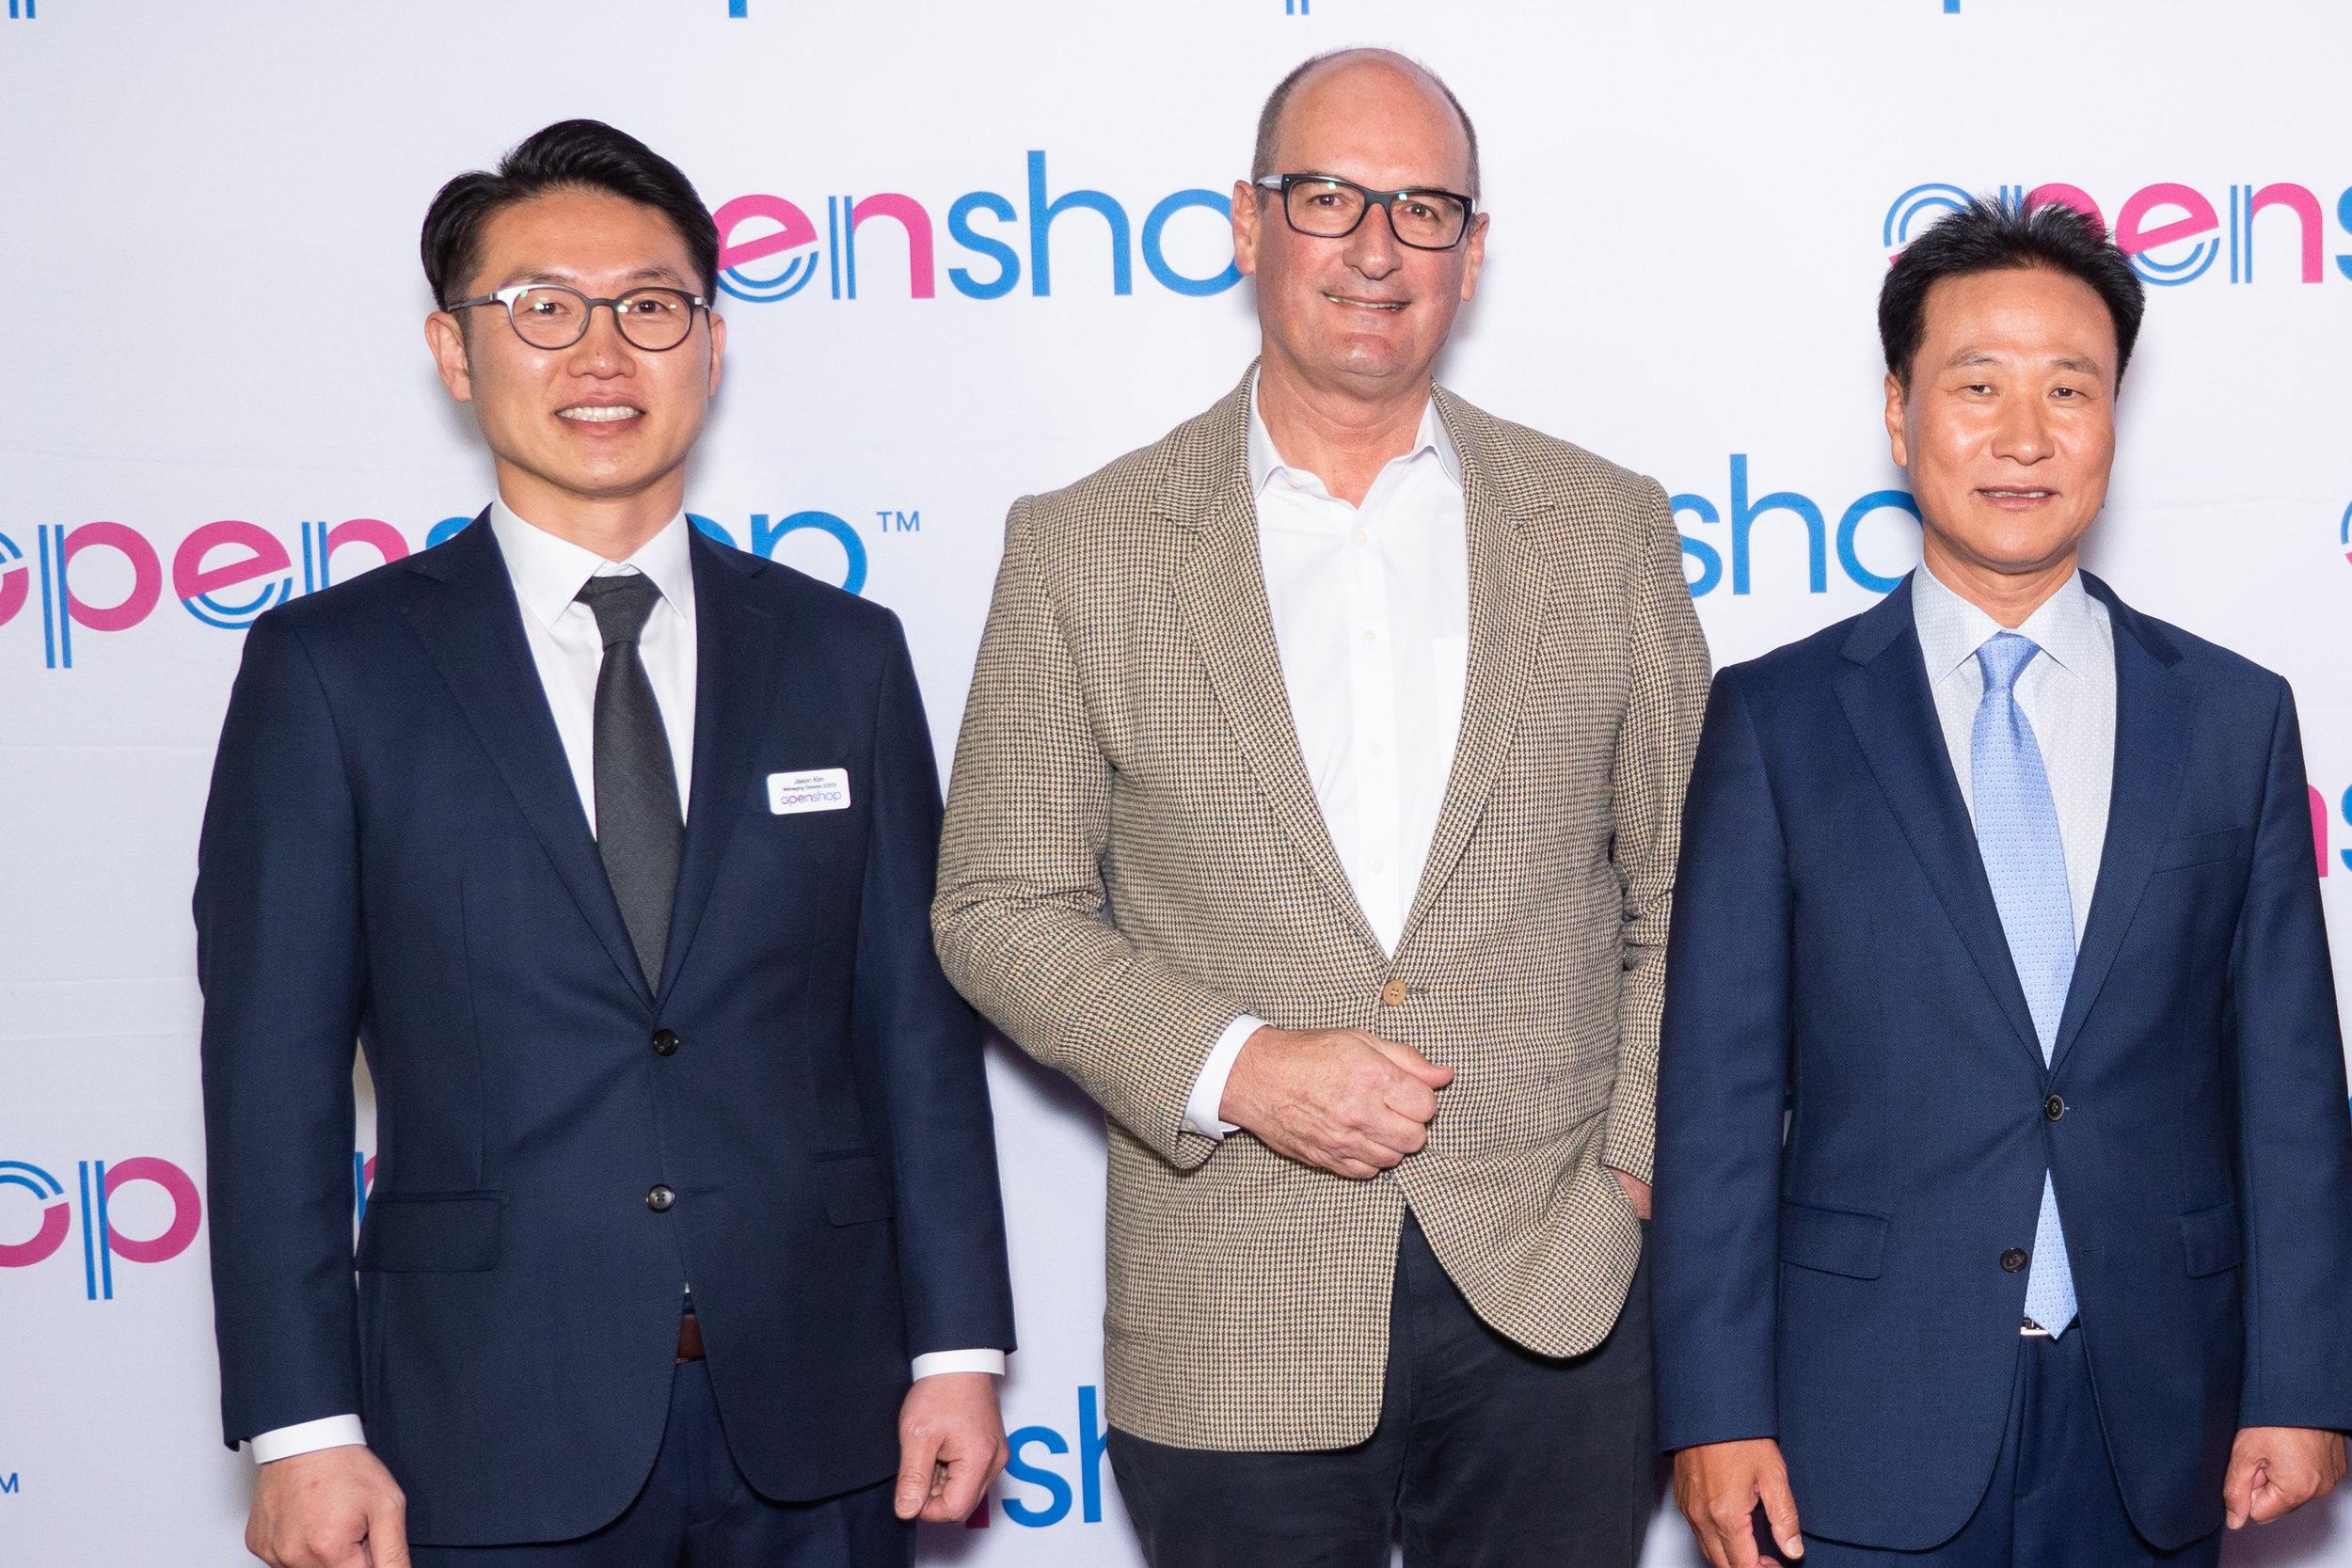 CEO of openshop Jason Kim, Kochie and President Hyundai Home Shopping Chan Suk Kang.jpg